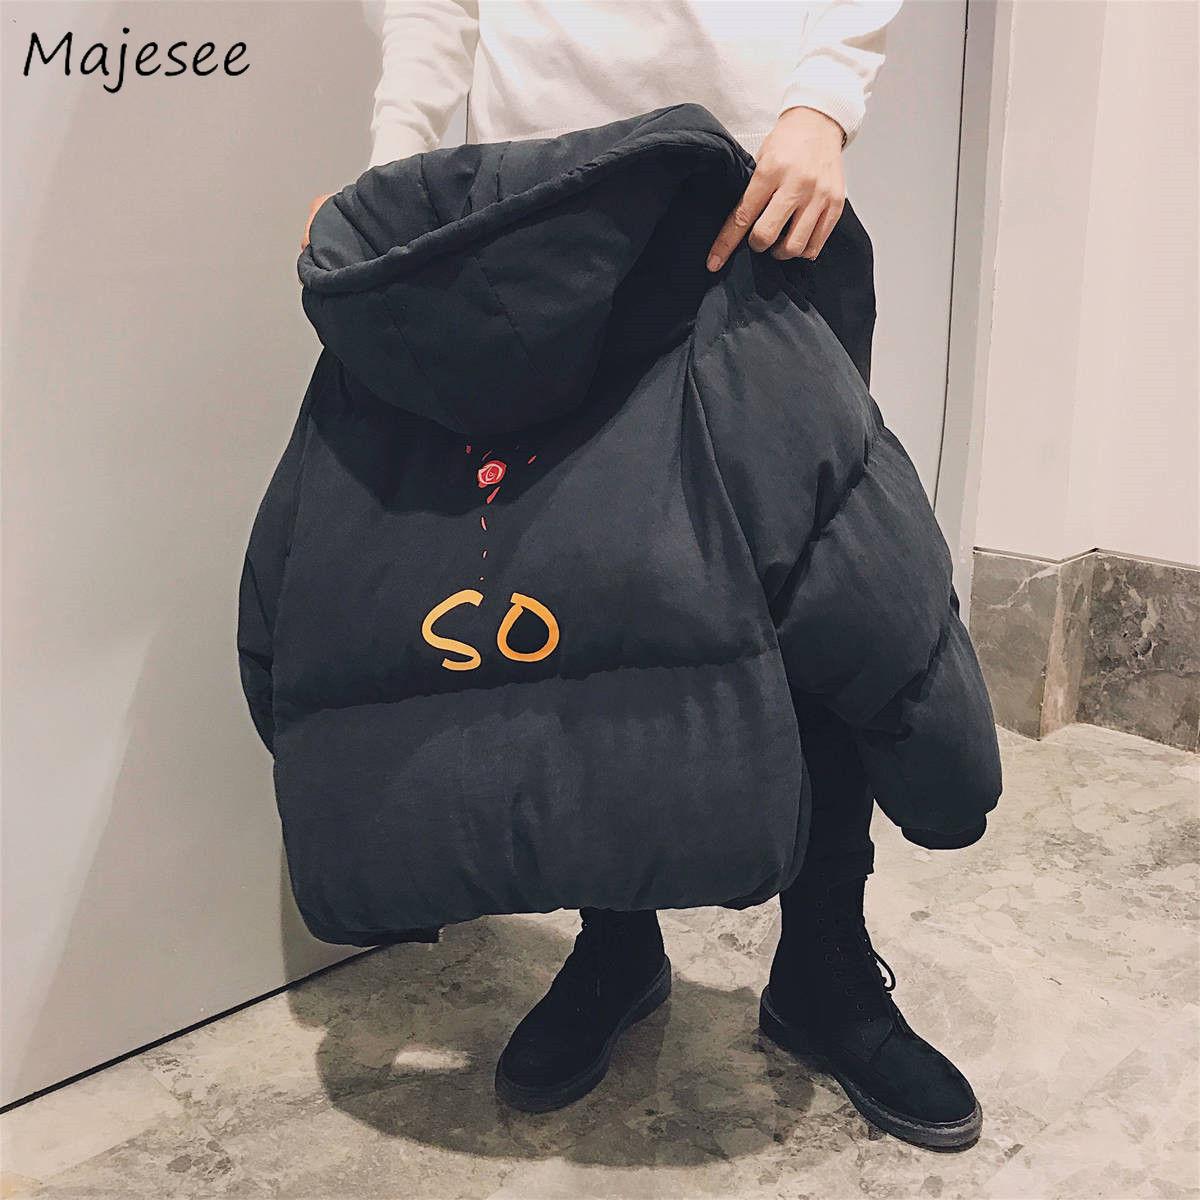 YUNY Mens Plus Velvet Pocket Thickening with Zips Turtleneck Hood Sweatshirt Dark Grey S